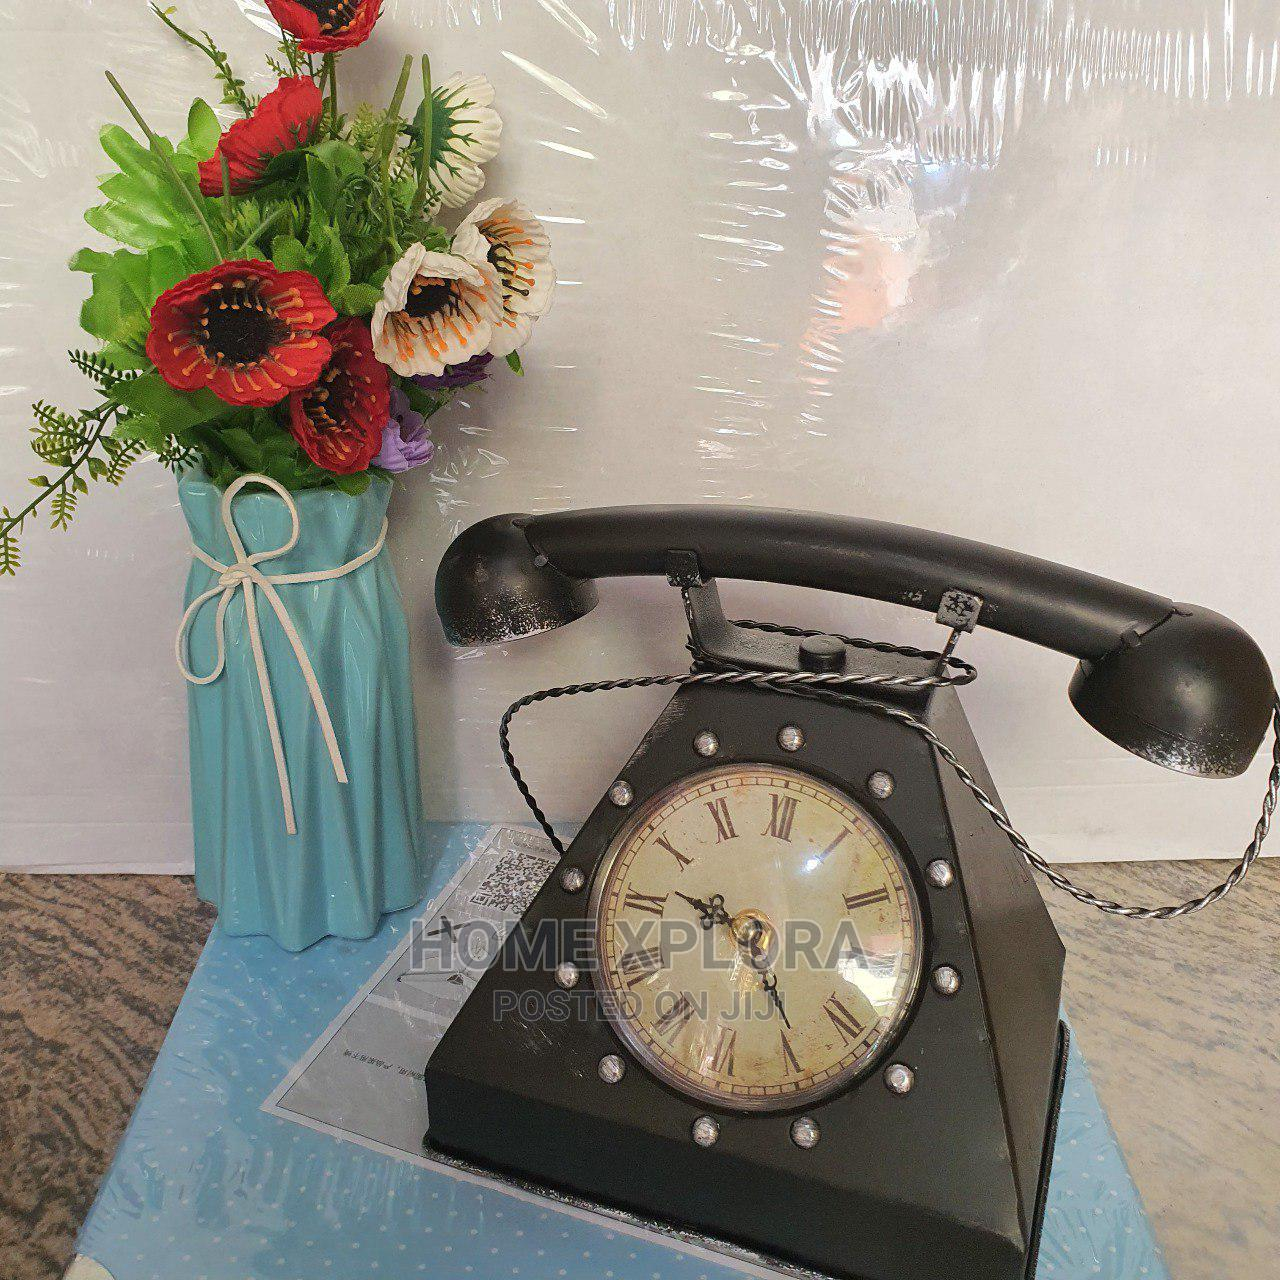 Vintage Telephone Decorative Figurine